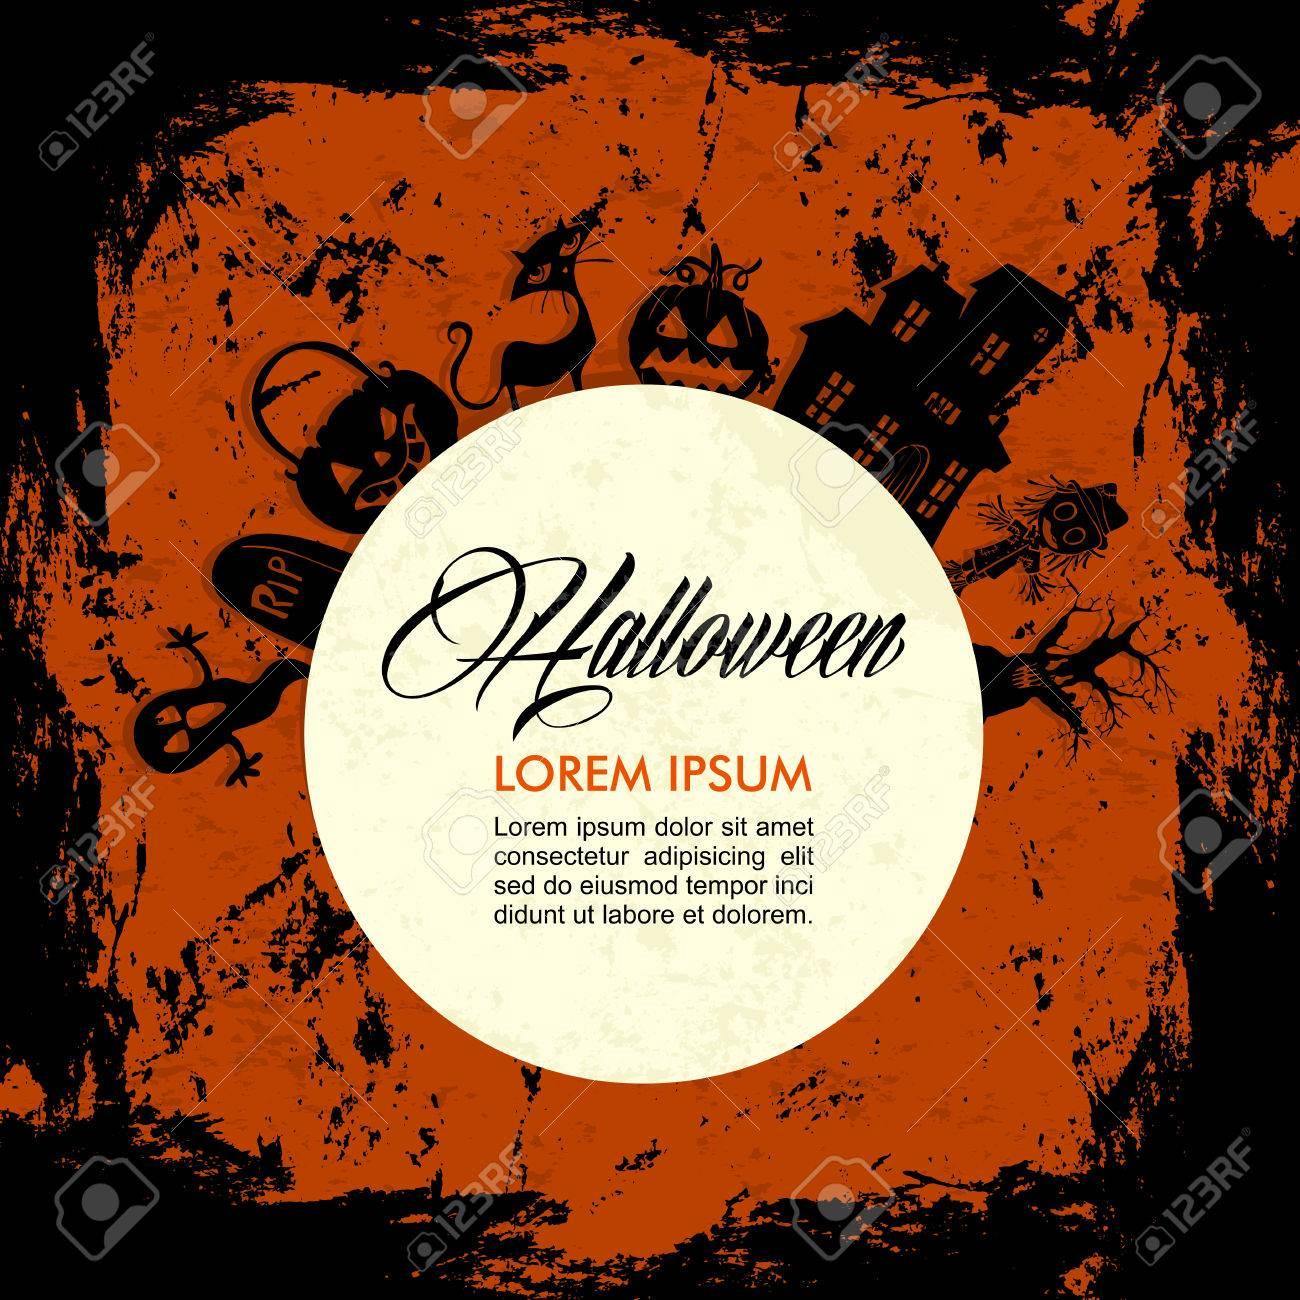 Halloween elements full moon design, customizable text over grunge background. Stock Vector - 22284415